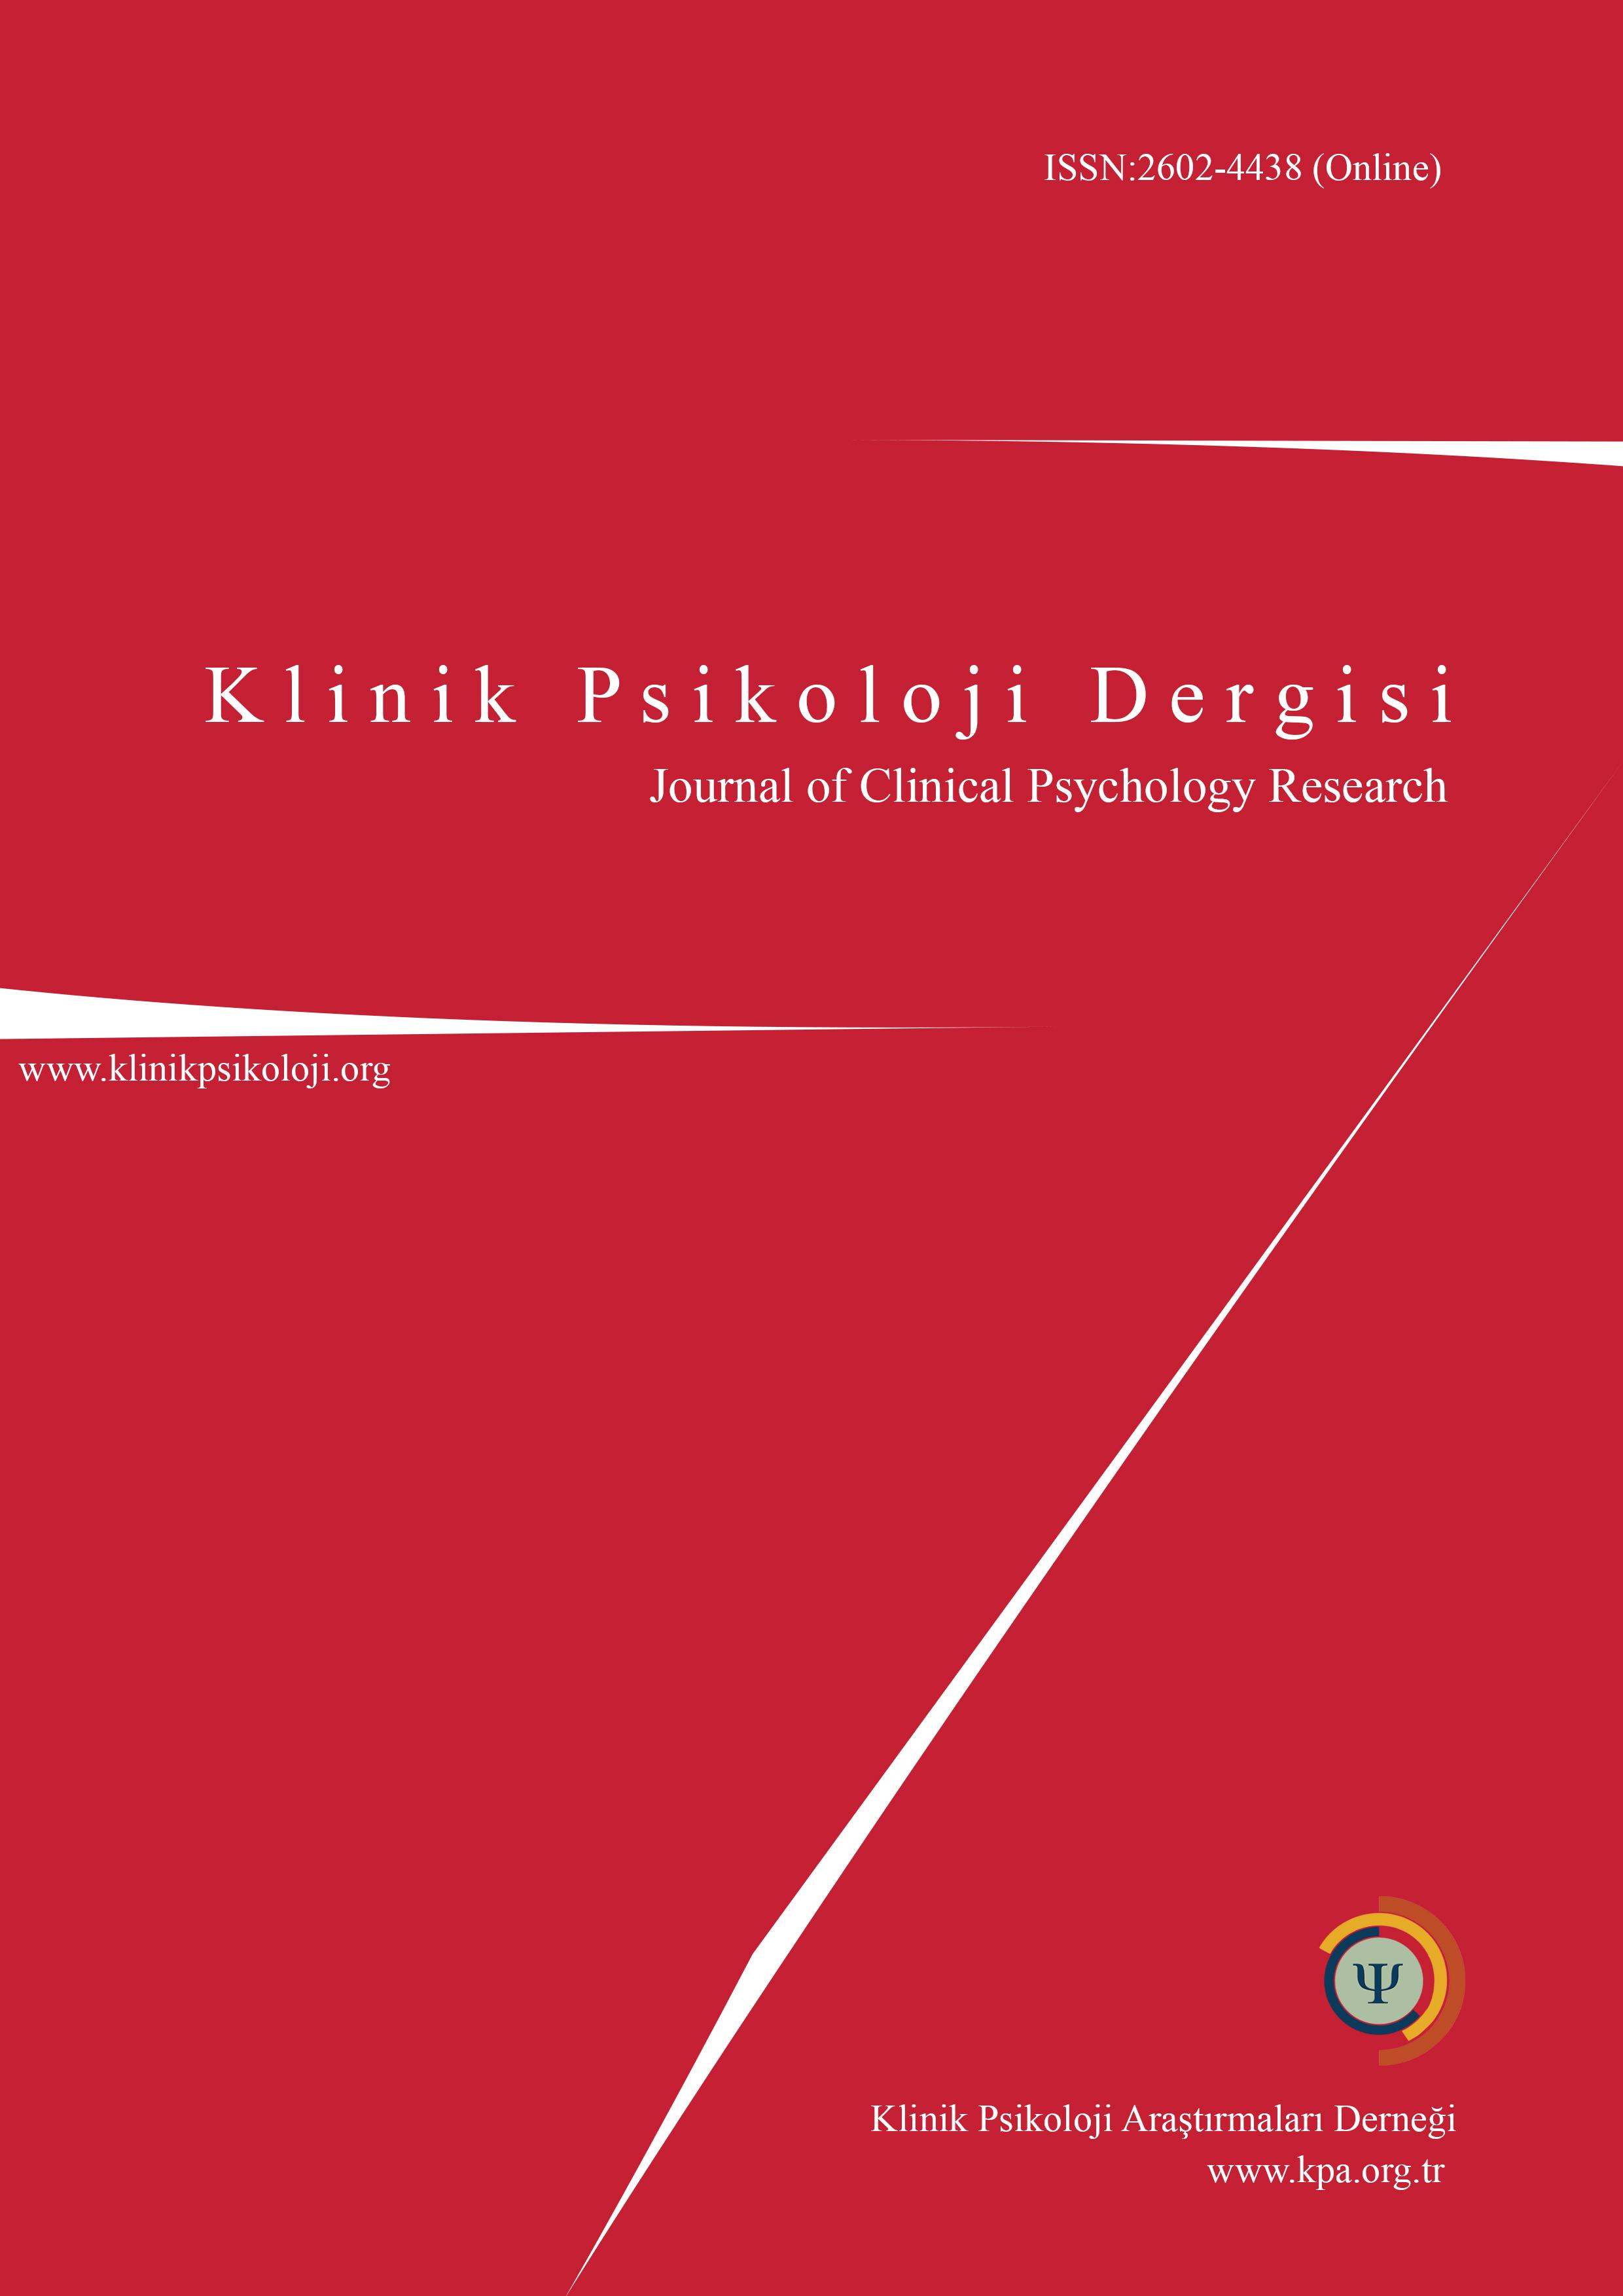 Klinik Psikoloji Dergisi-Asos İndeks